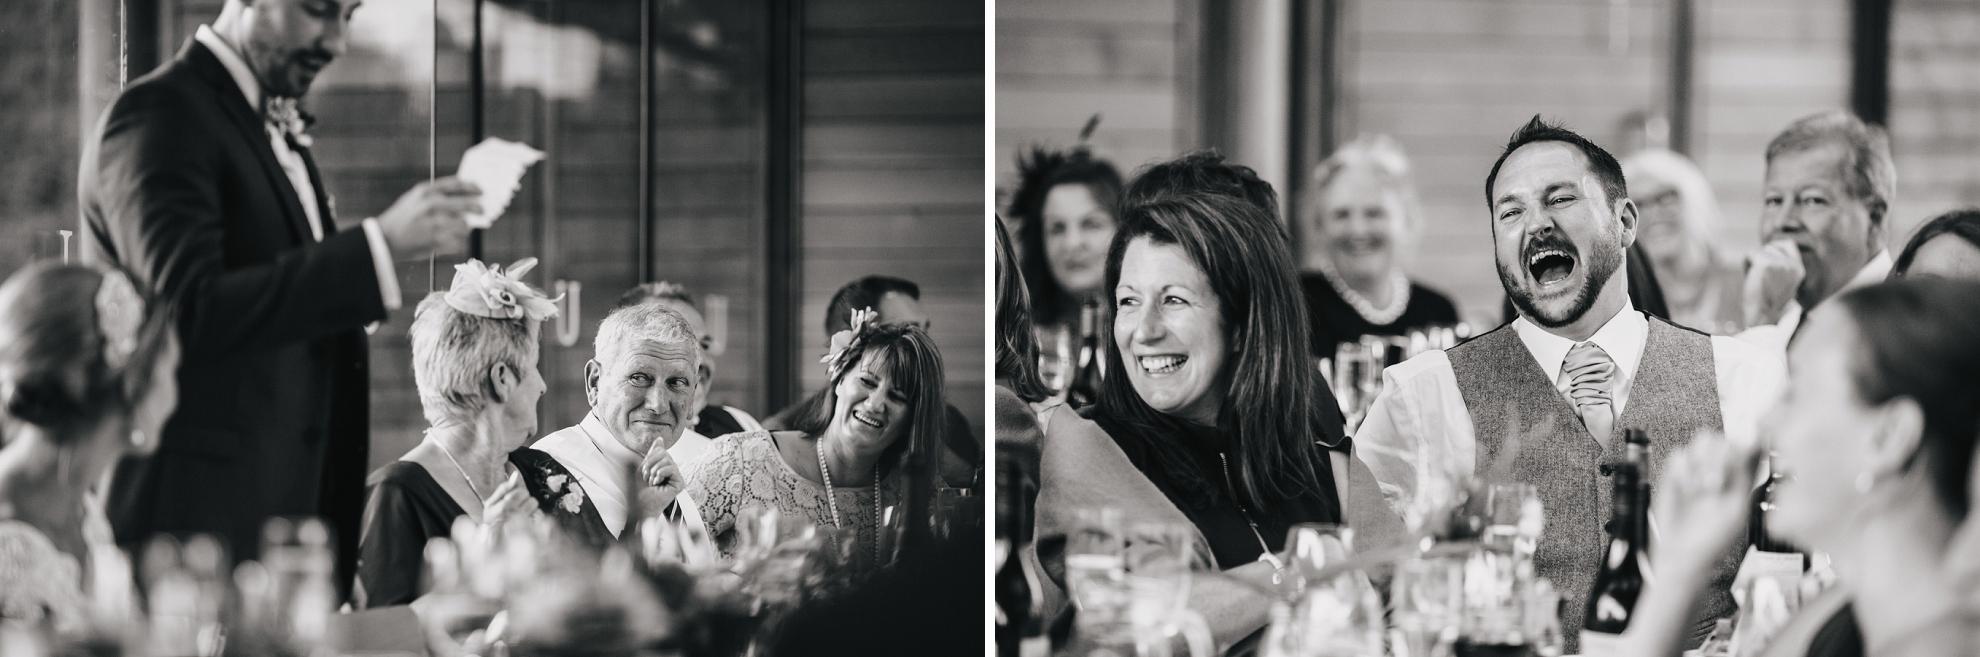 broughton-hall-wedding-photographer_065